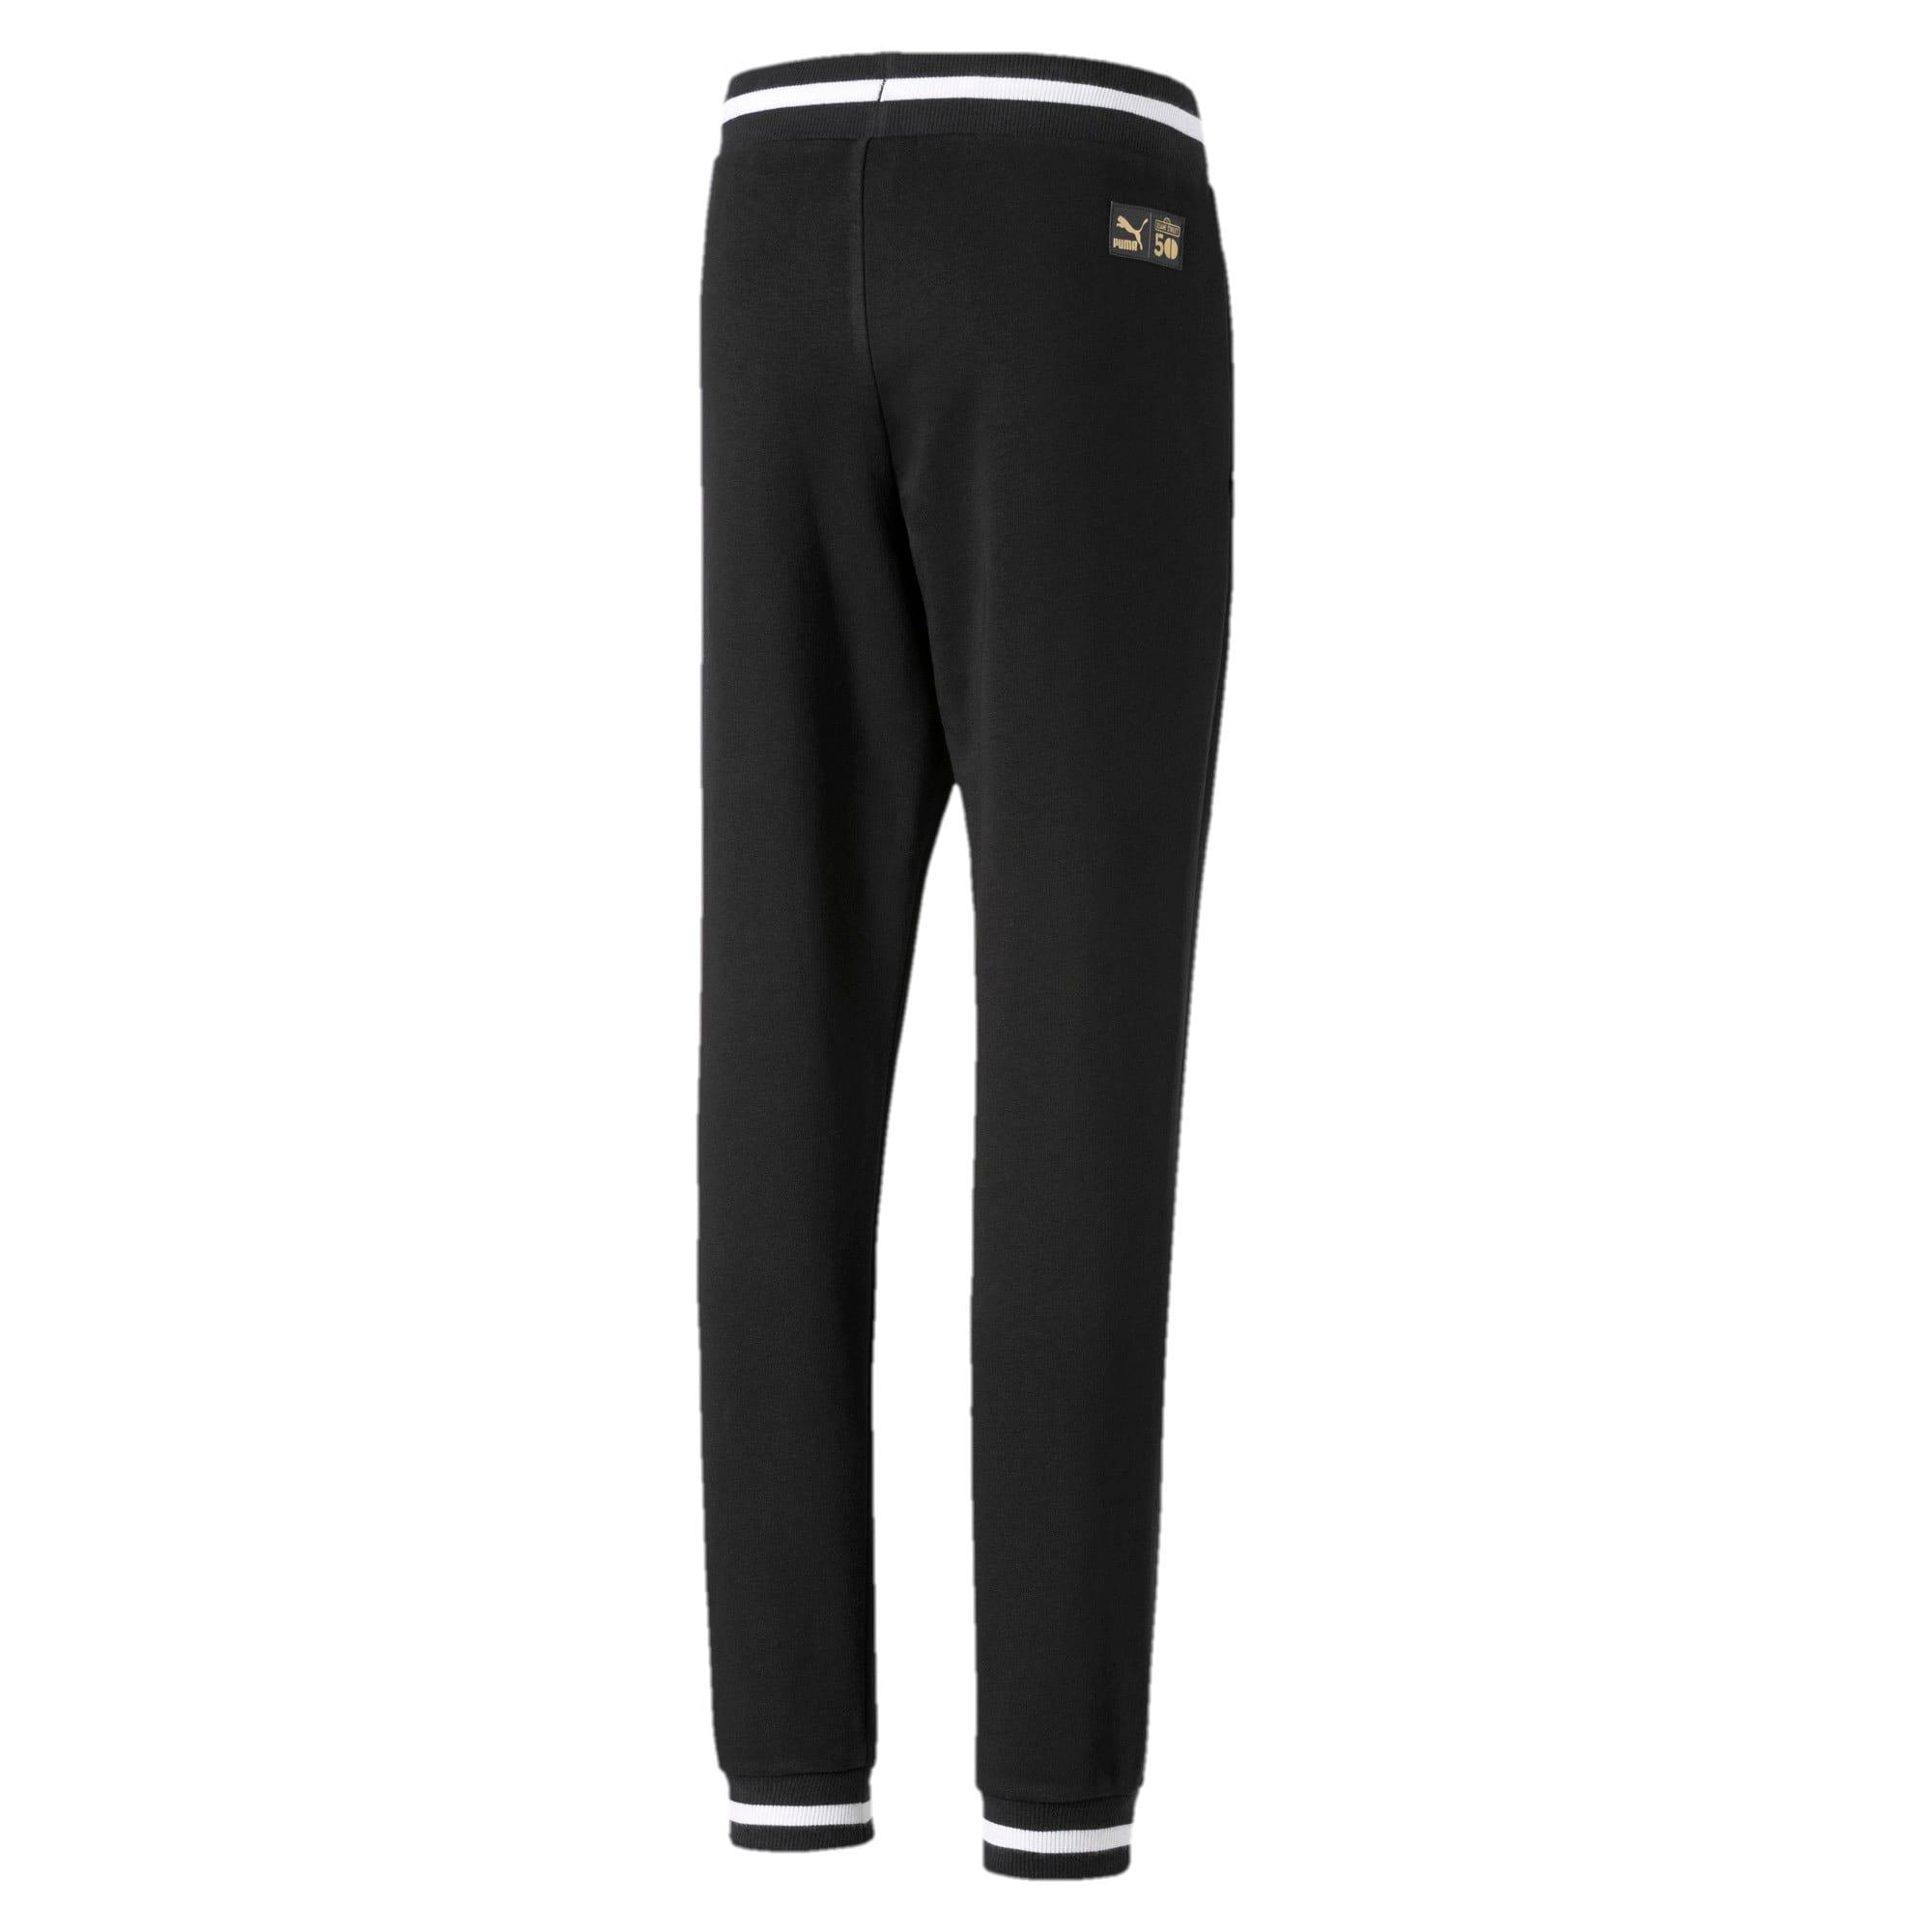 Anteprima 2 di Sesame Street Knitted Boys' Sweat Pants, Puma Black, medio